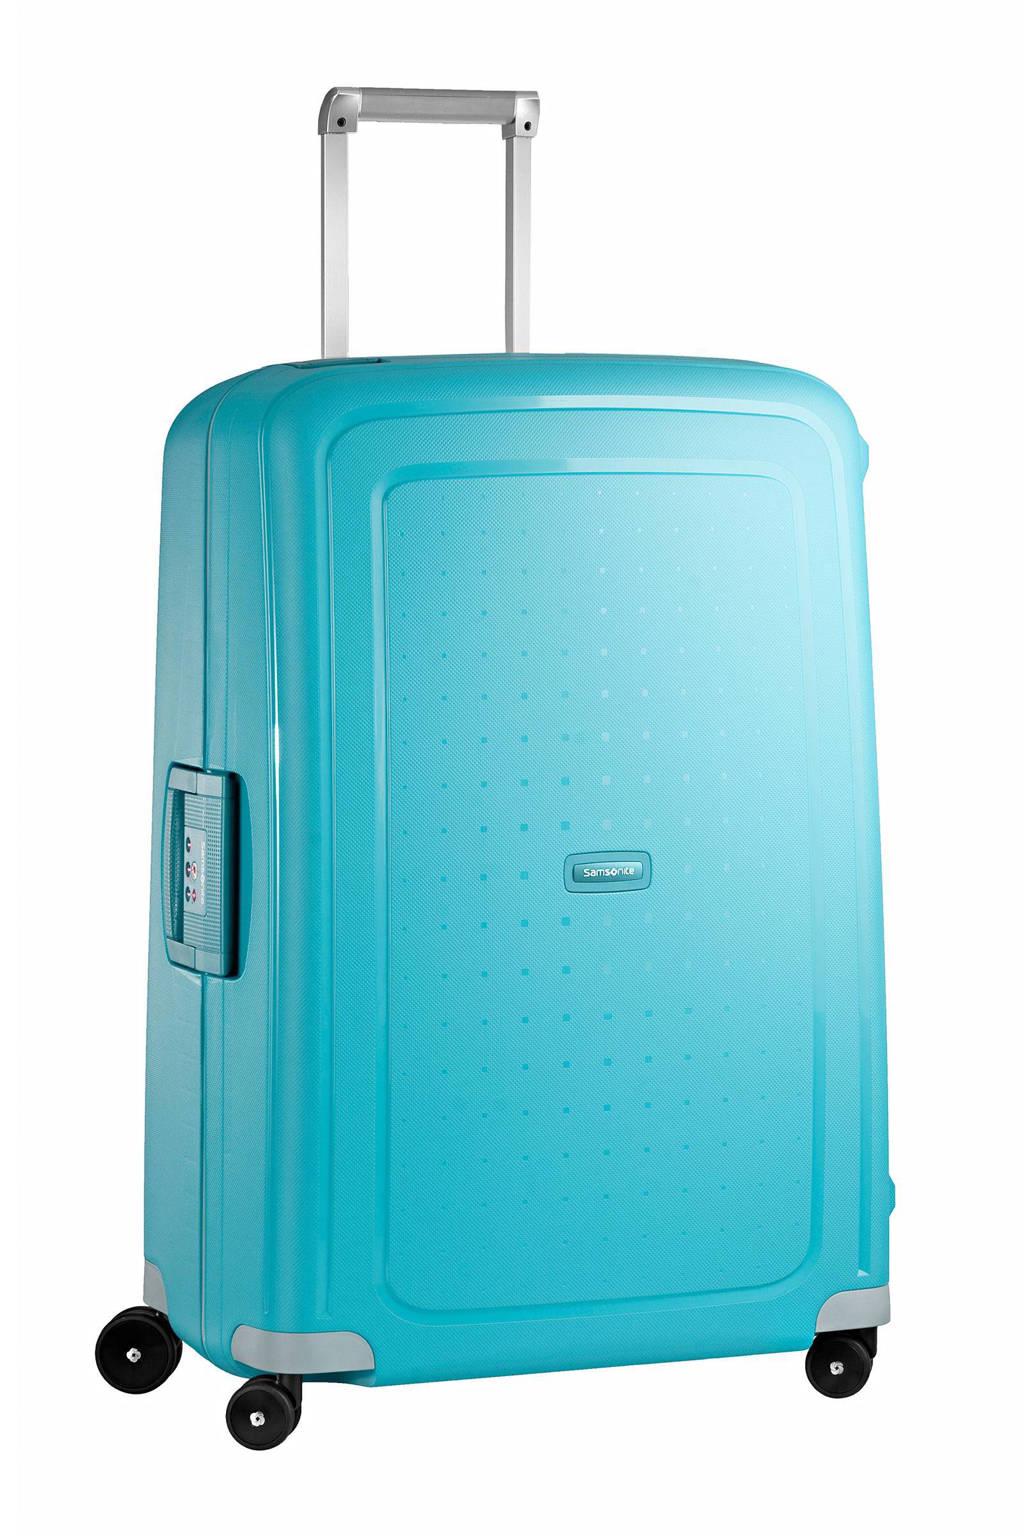 Samsonite S'Cure koffer (75 cm), Turquoise